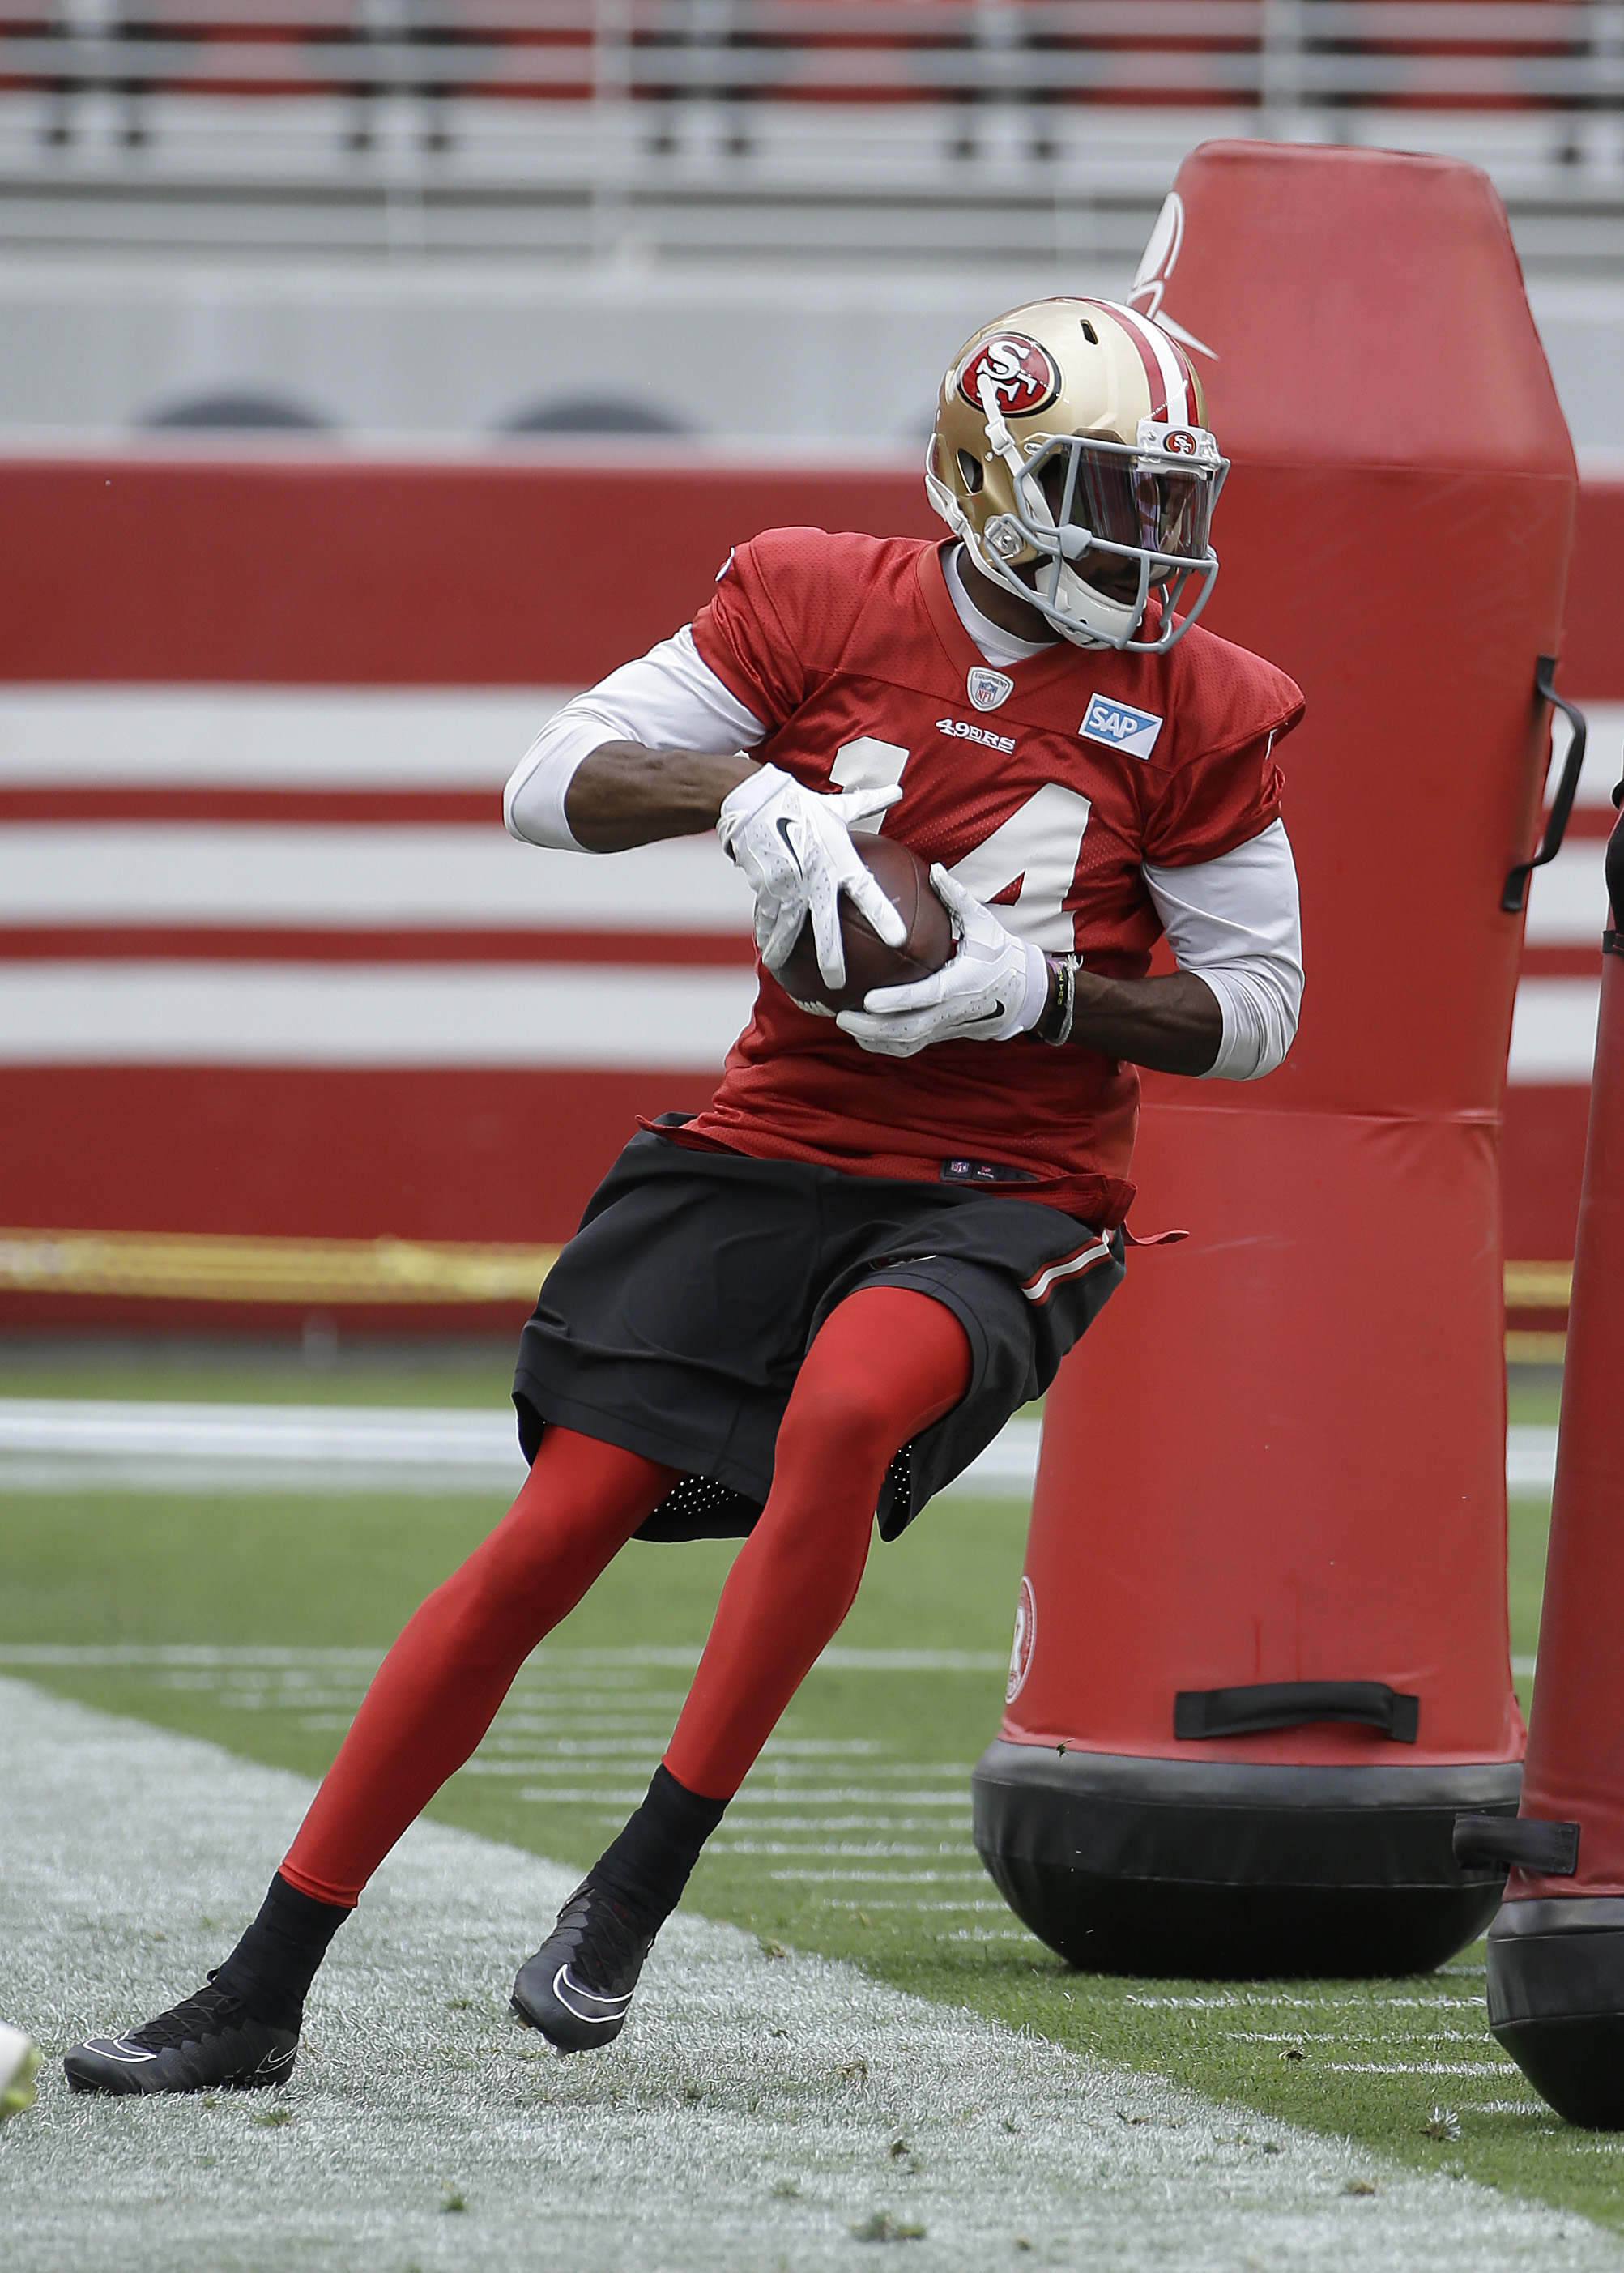 San Francisco 49ers wide receiver Jerome Simpson runs a drill during an NFL football mini-camp in Santa Clara, Calif., Tuesday, June 9, 2015. (AP Photo/Jeff Chiu)